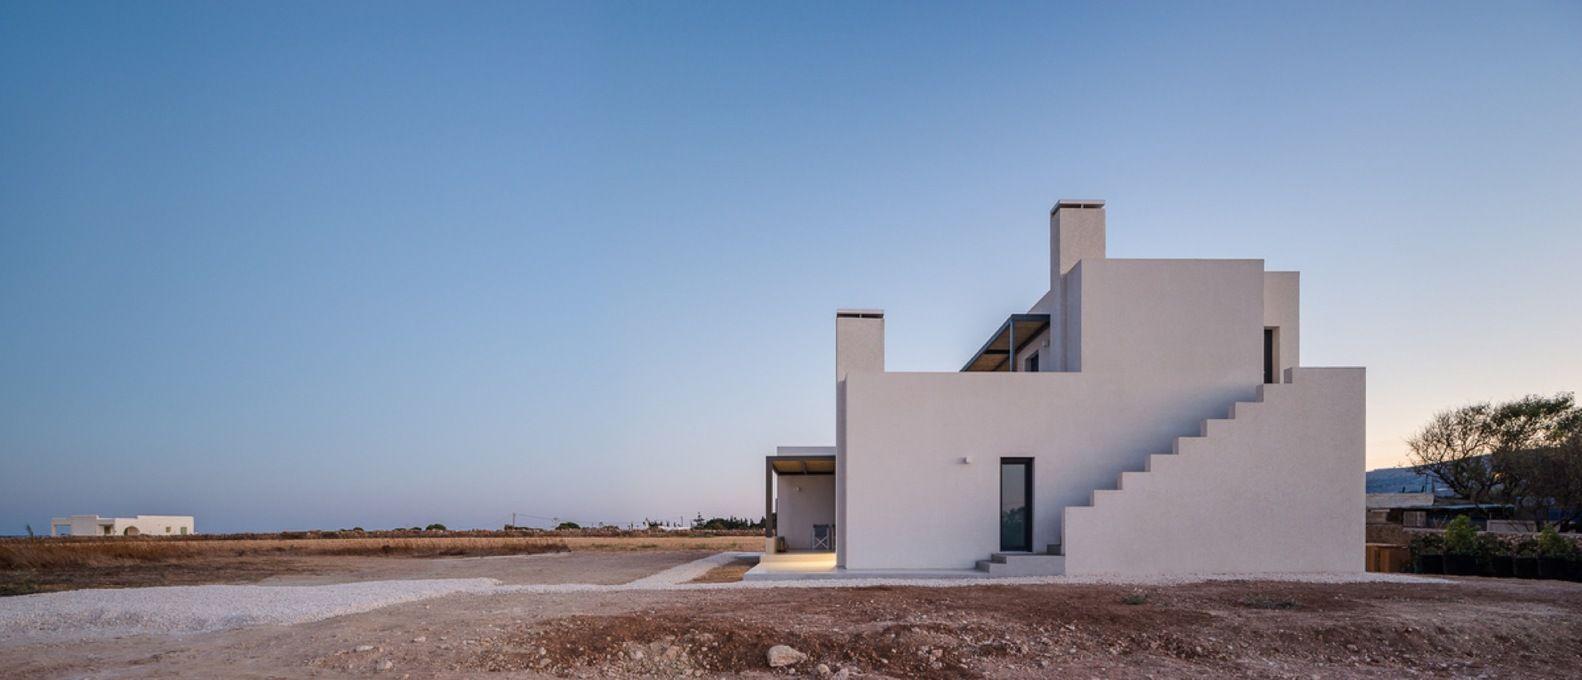 Kampos House / Lantavos Projects / ph: George Messaritakis